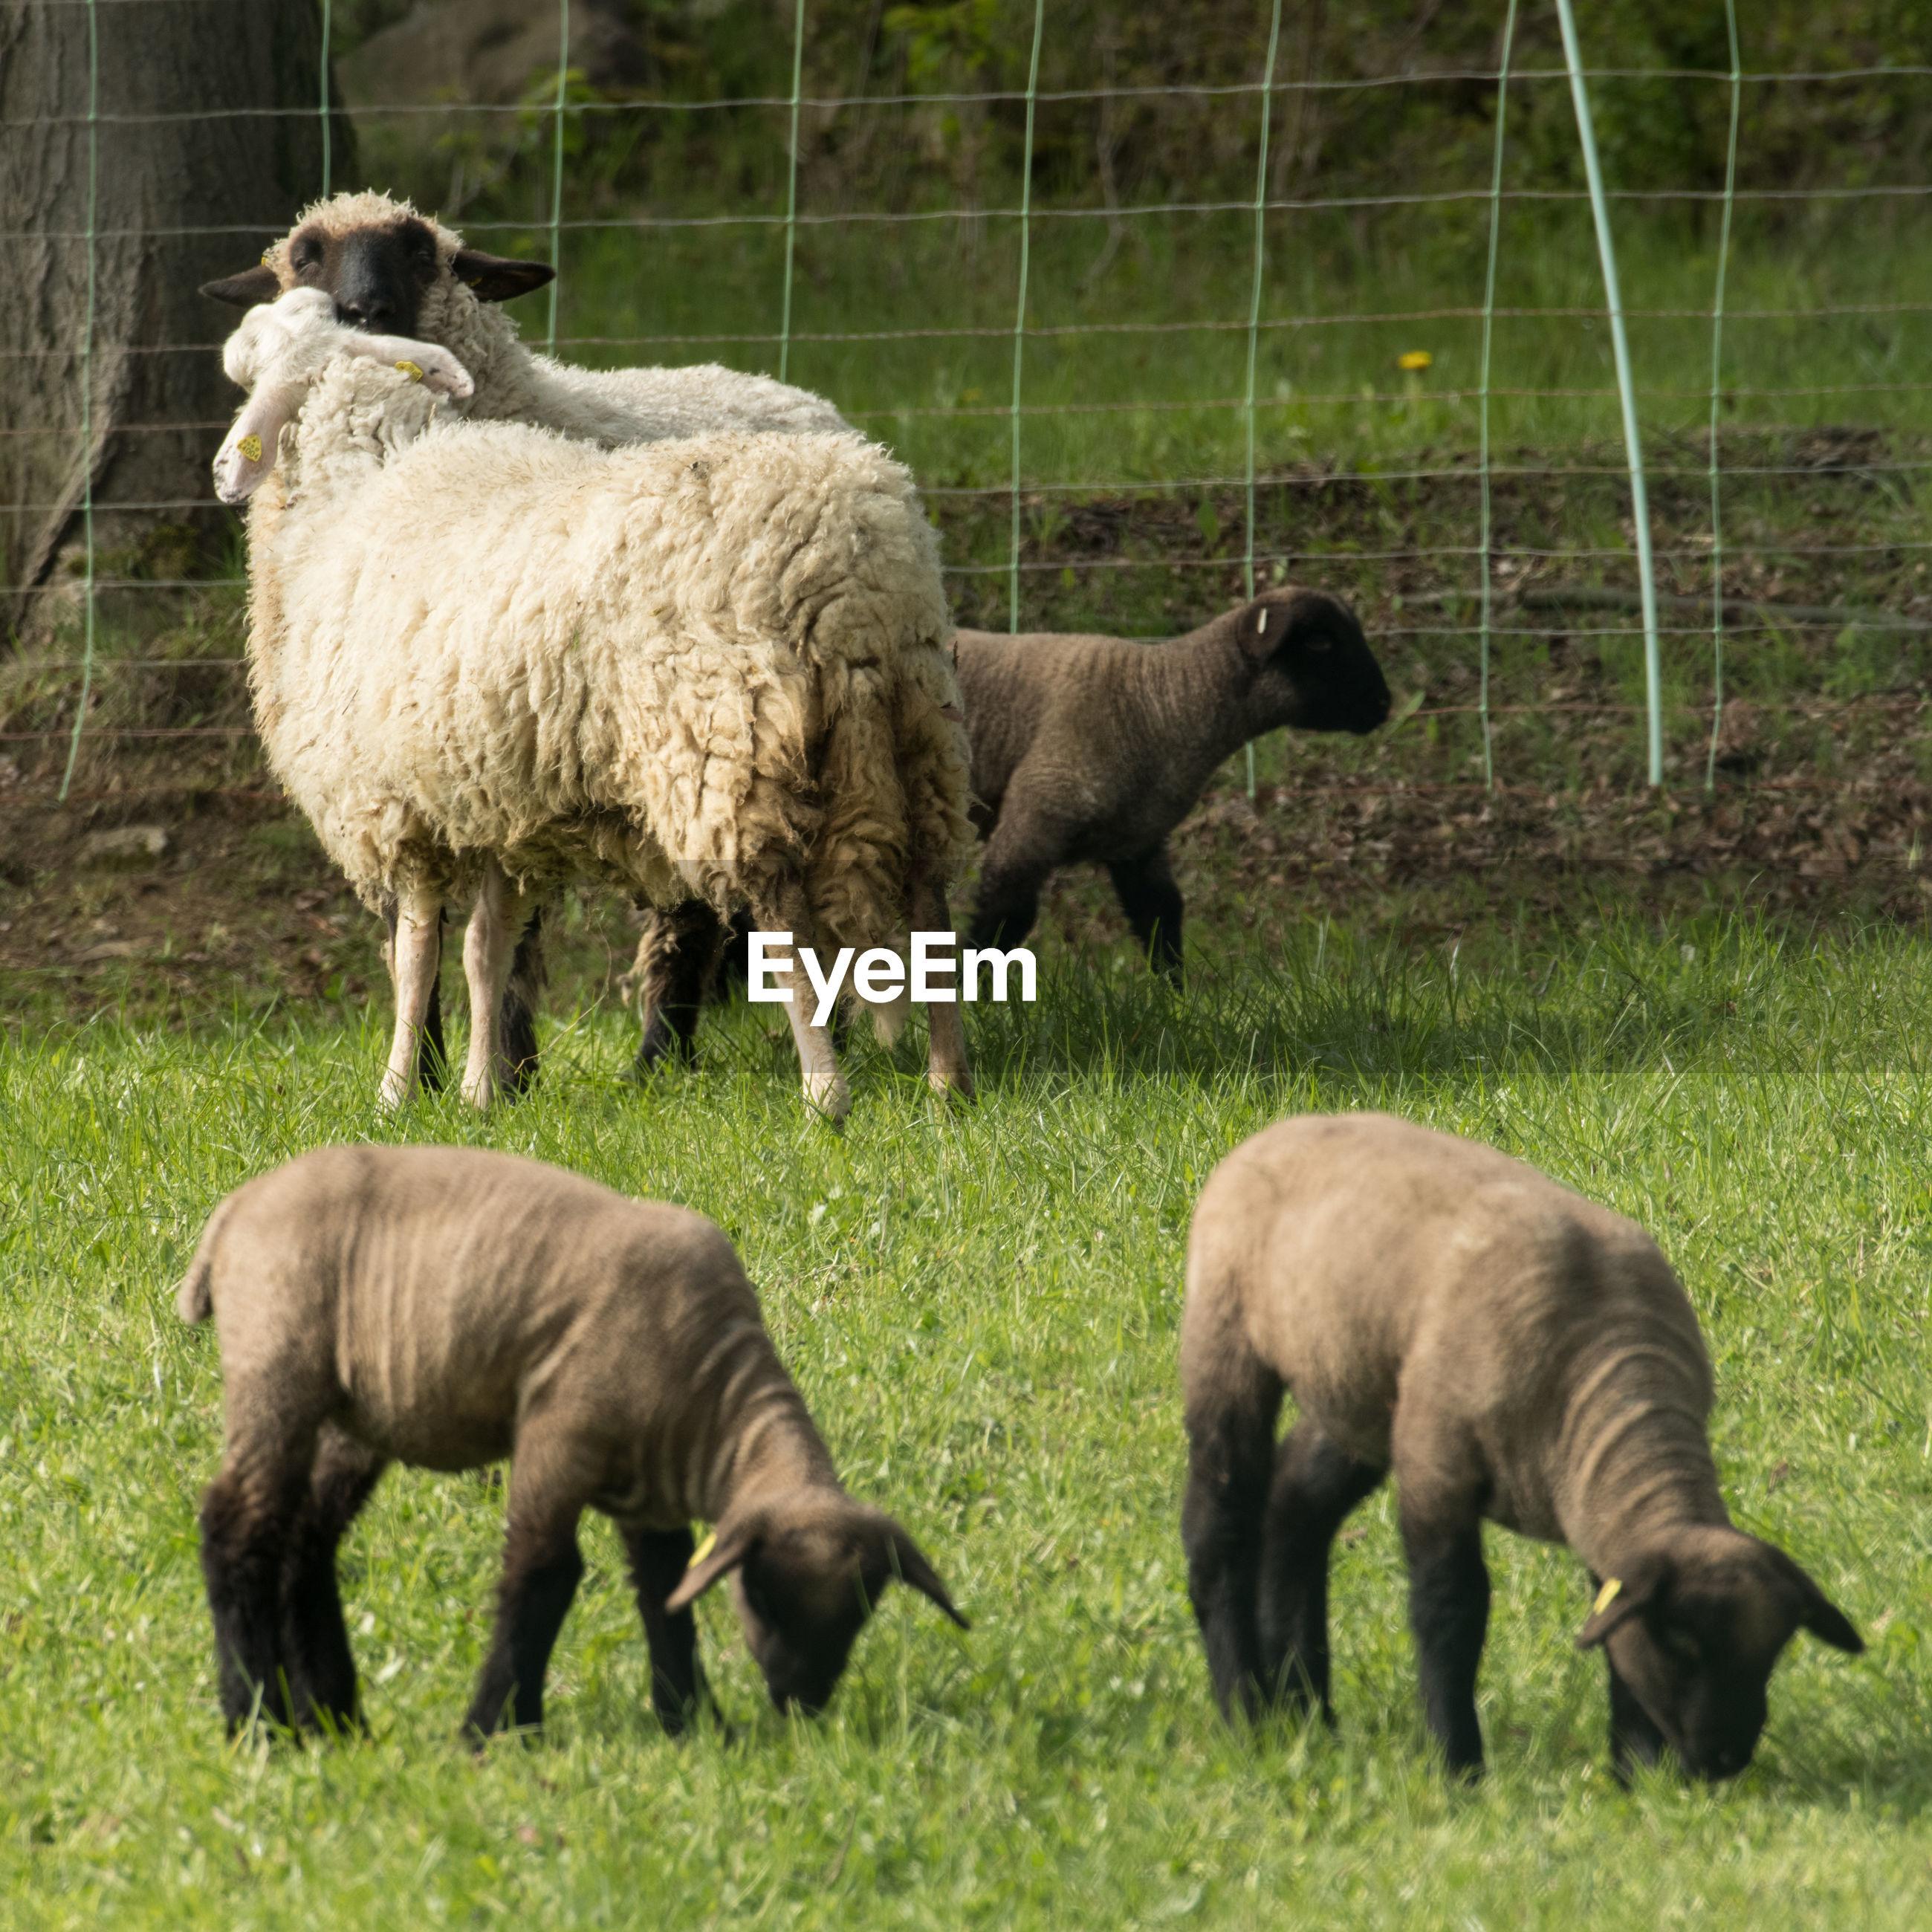 Sheep and lambs grazing at field